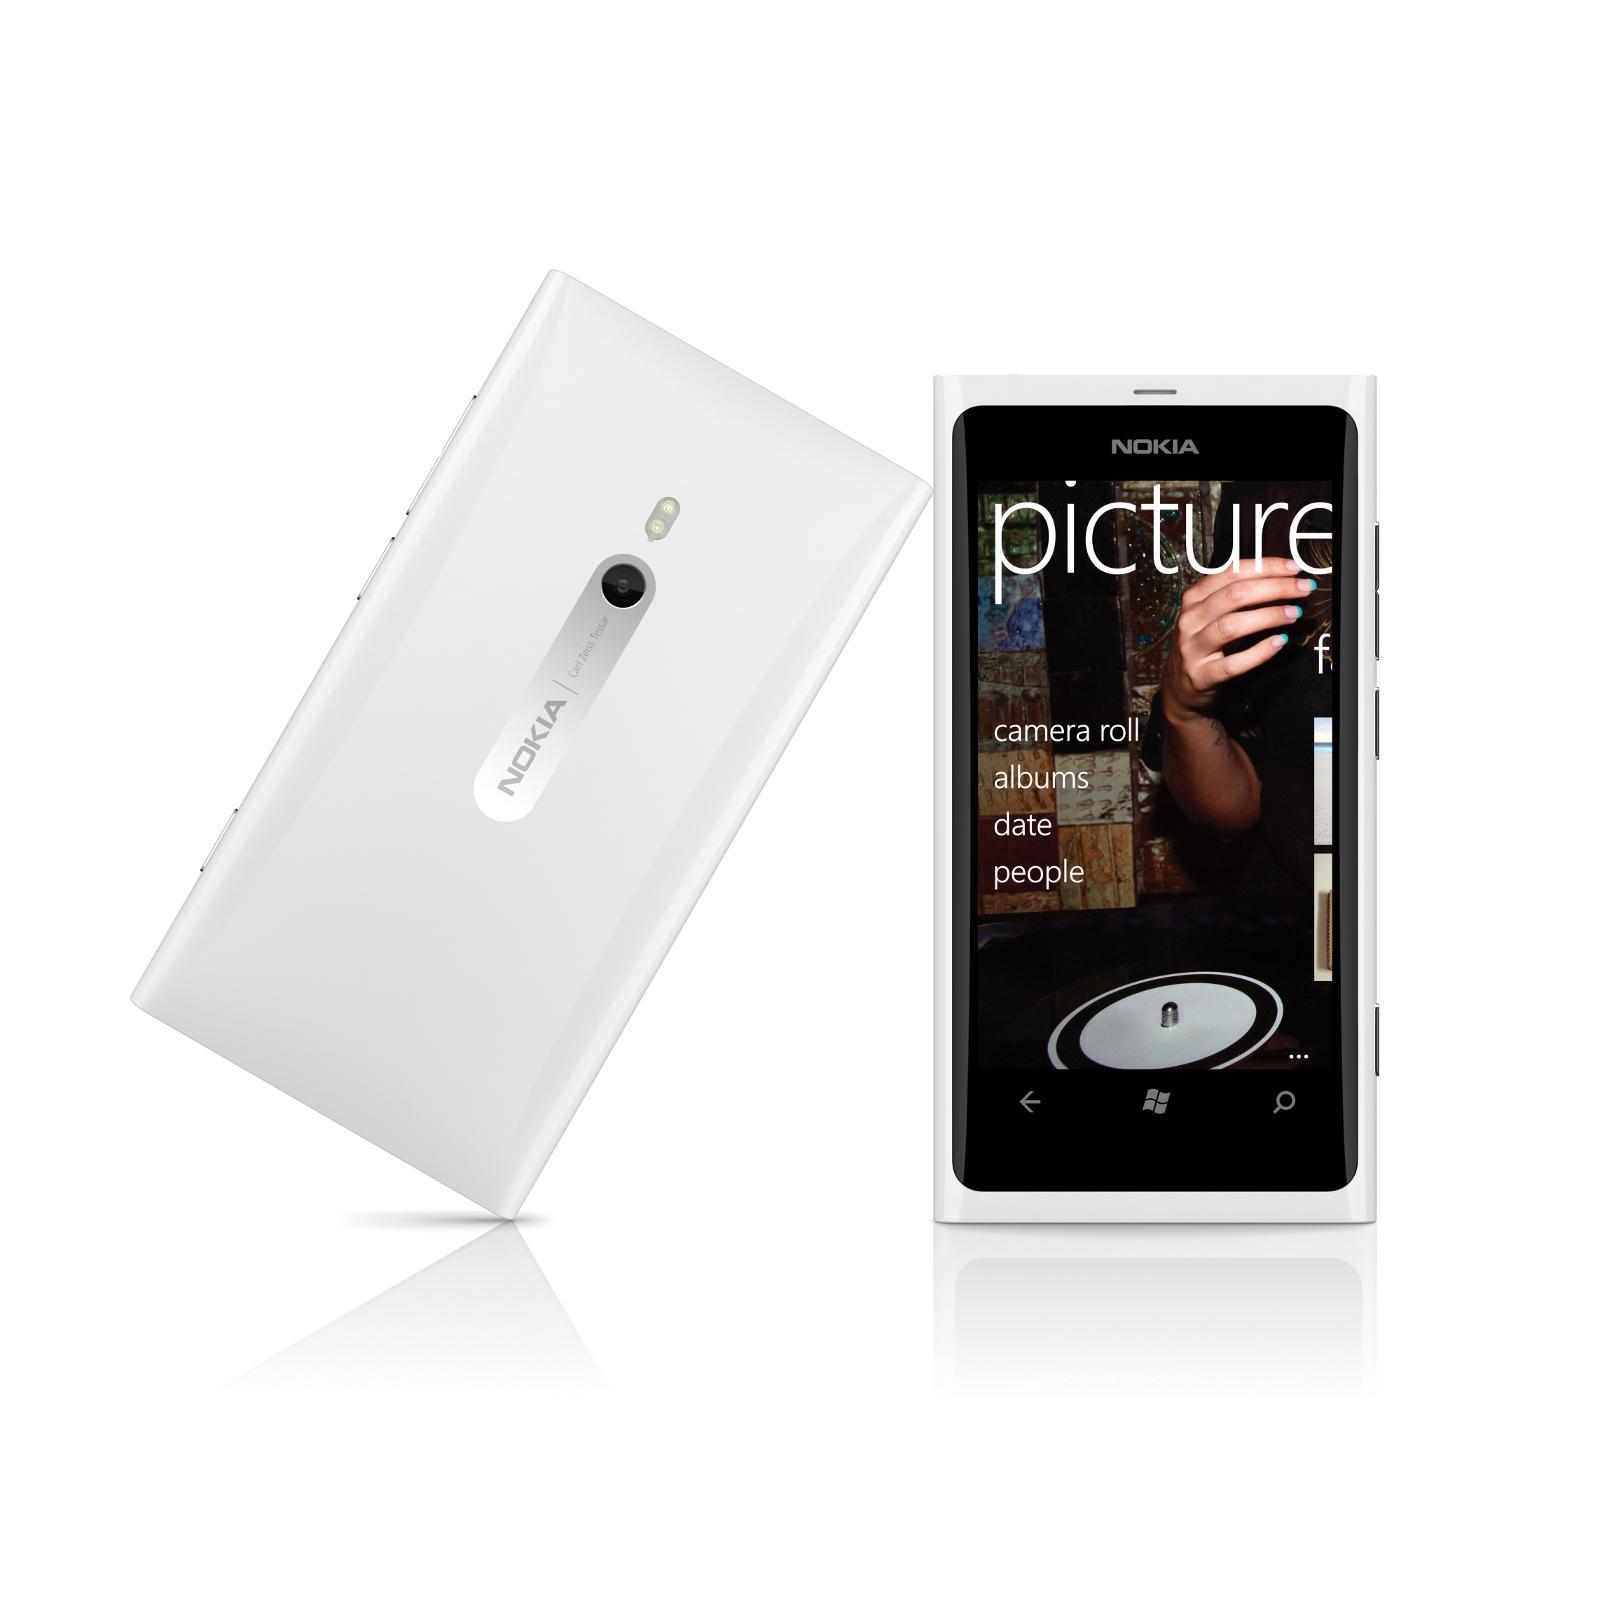 Nokia Lumia 800 16 Go - Blanc - Débloqué